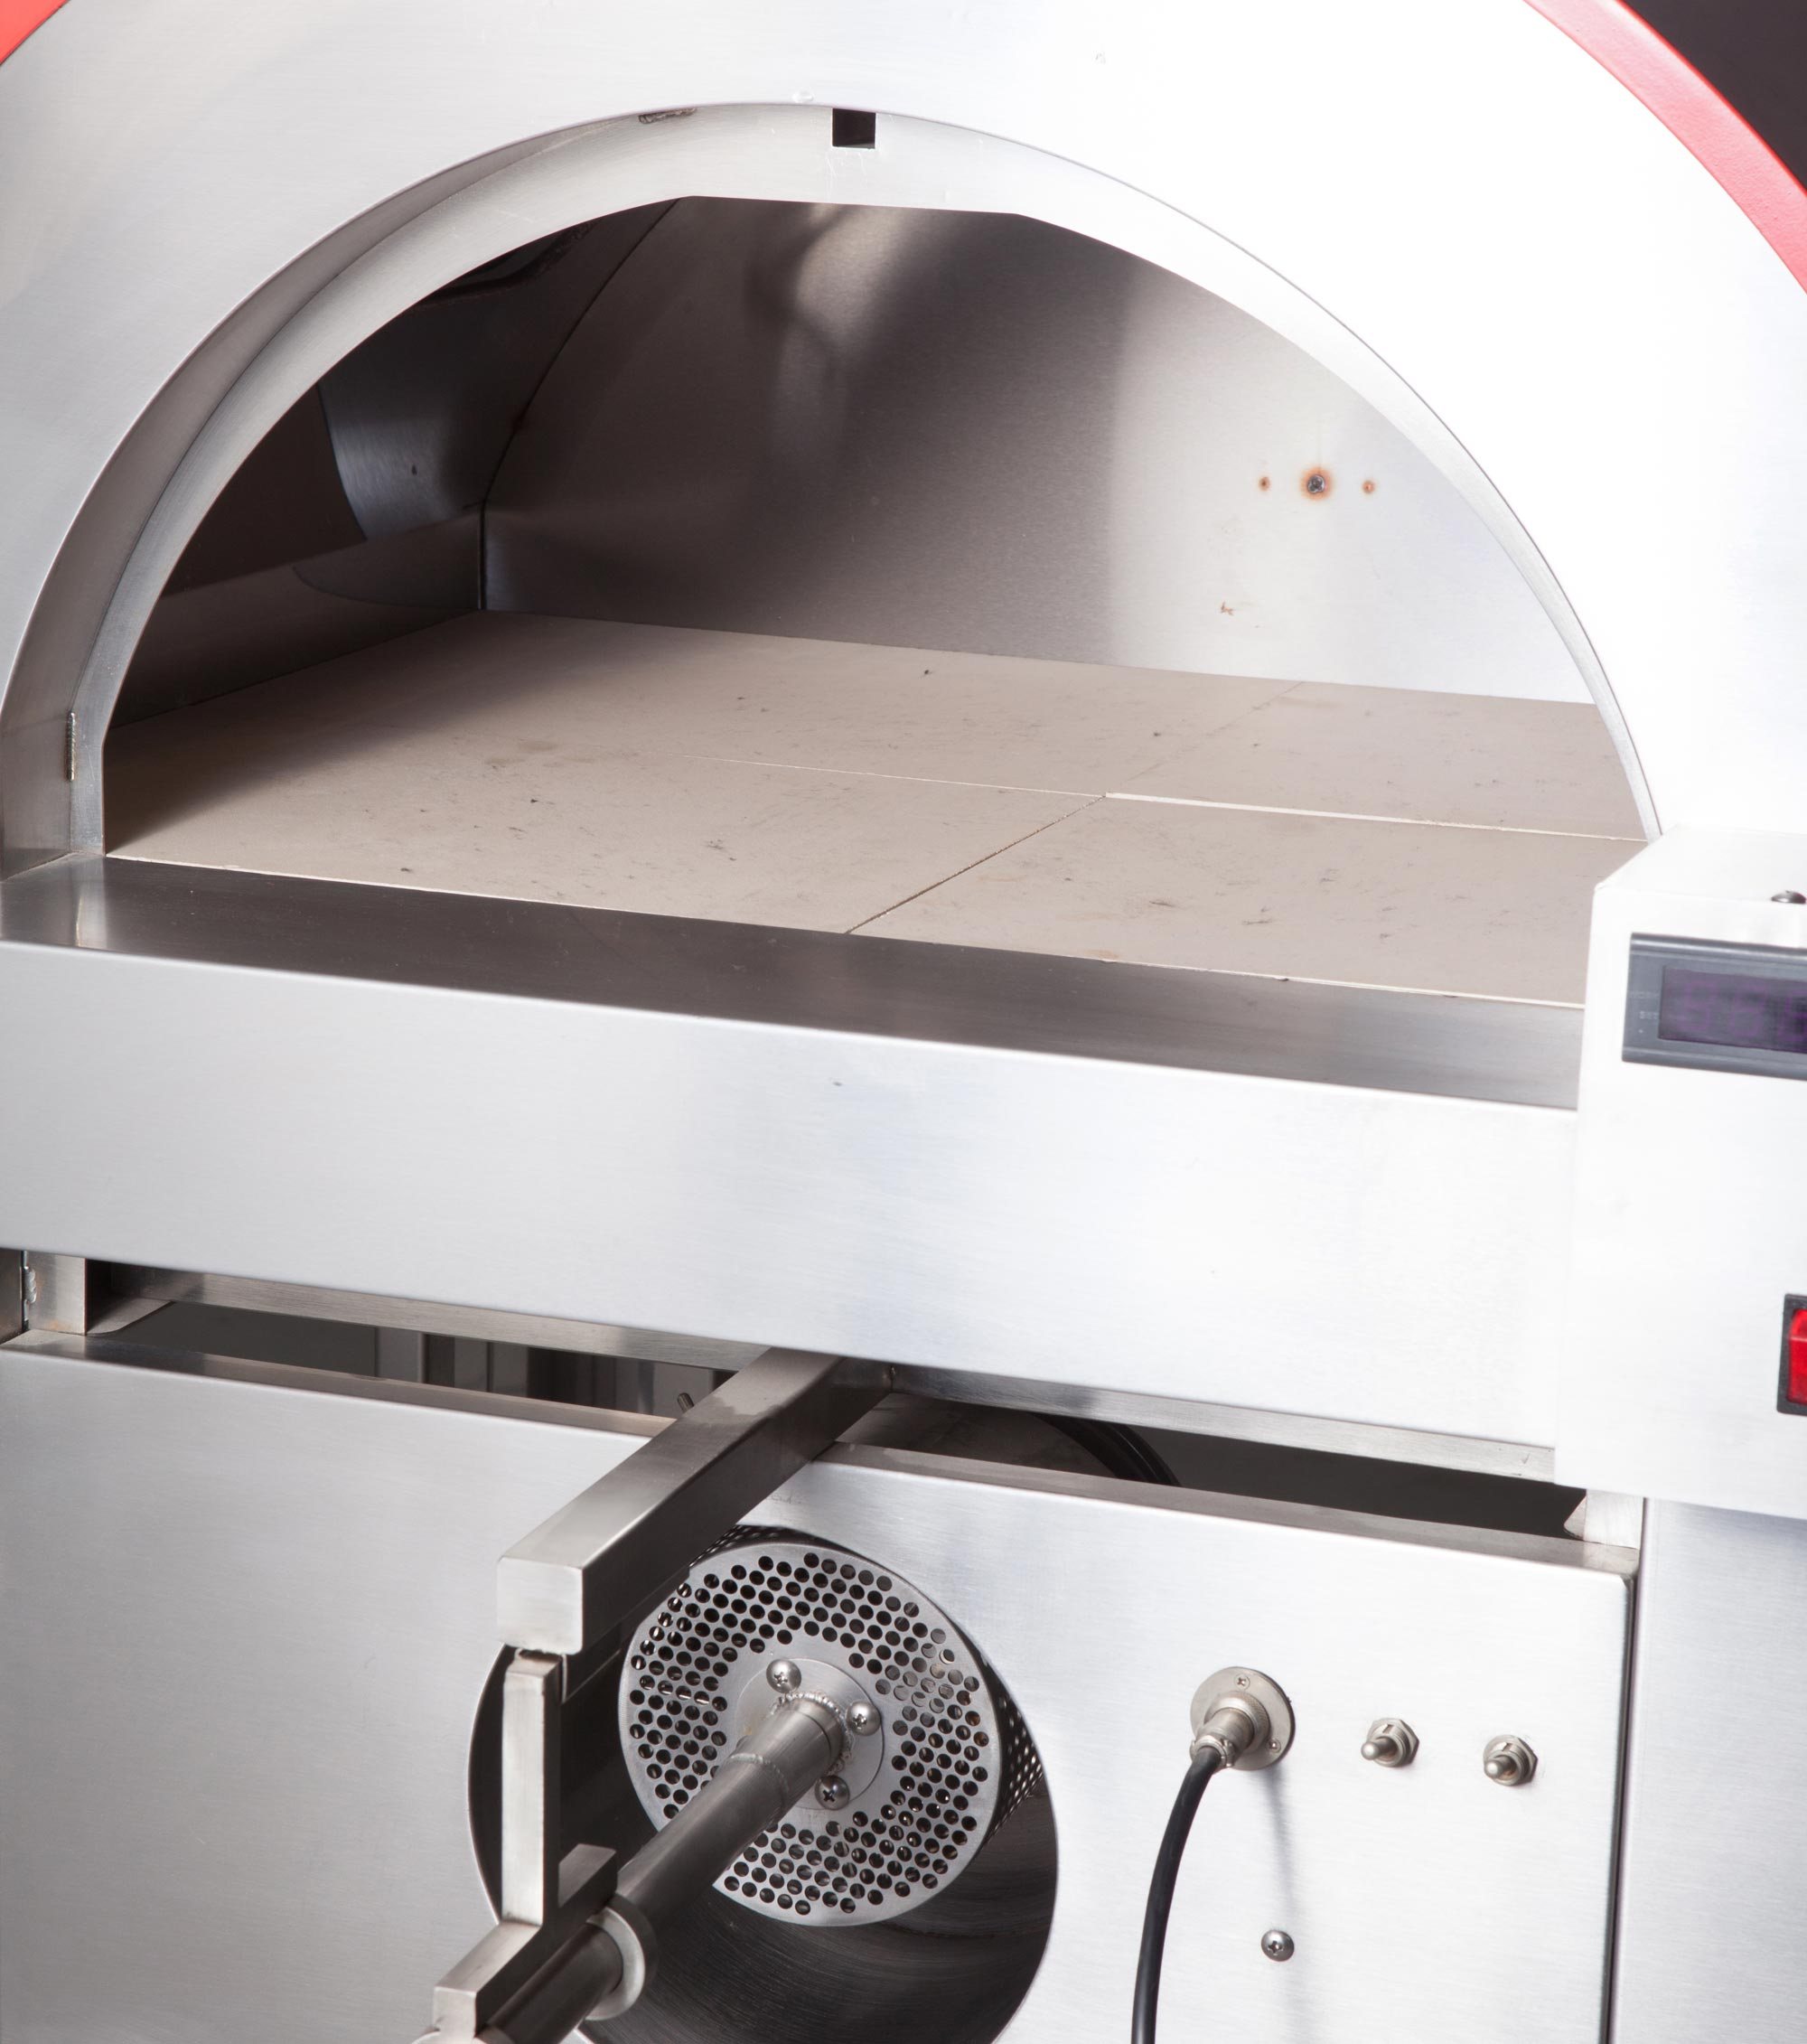 Pizzaofen / Brotbackofen / Flammkuchenofen D7263 Carini mit Gestell Bild 3